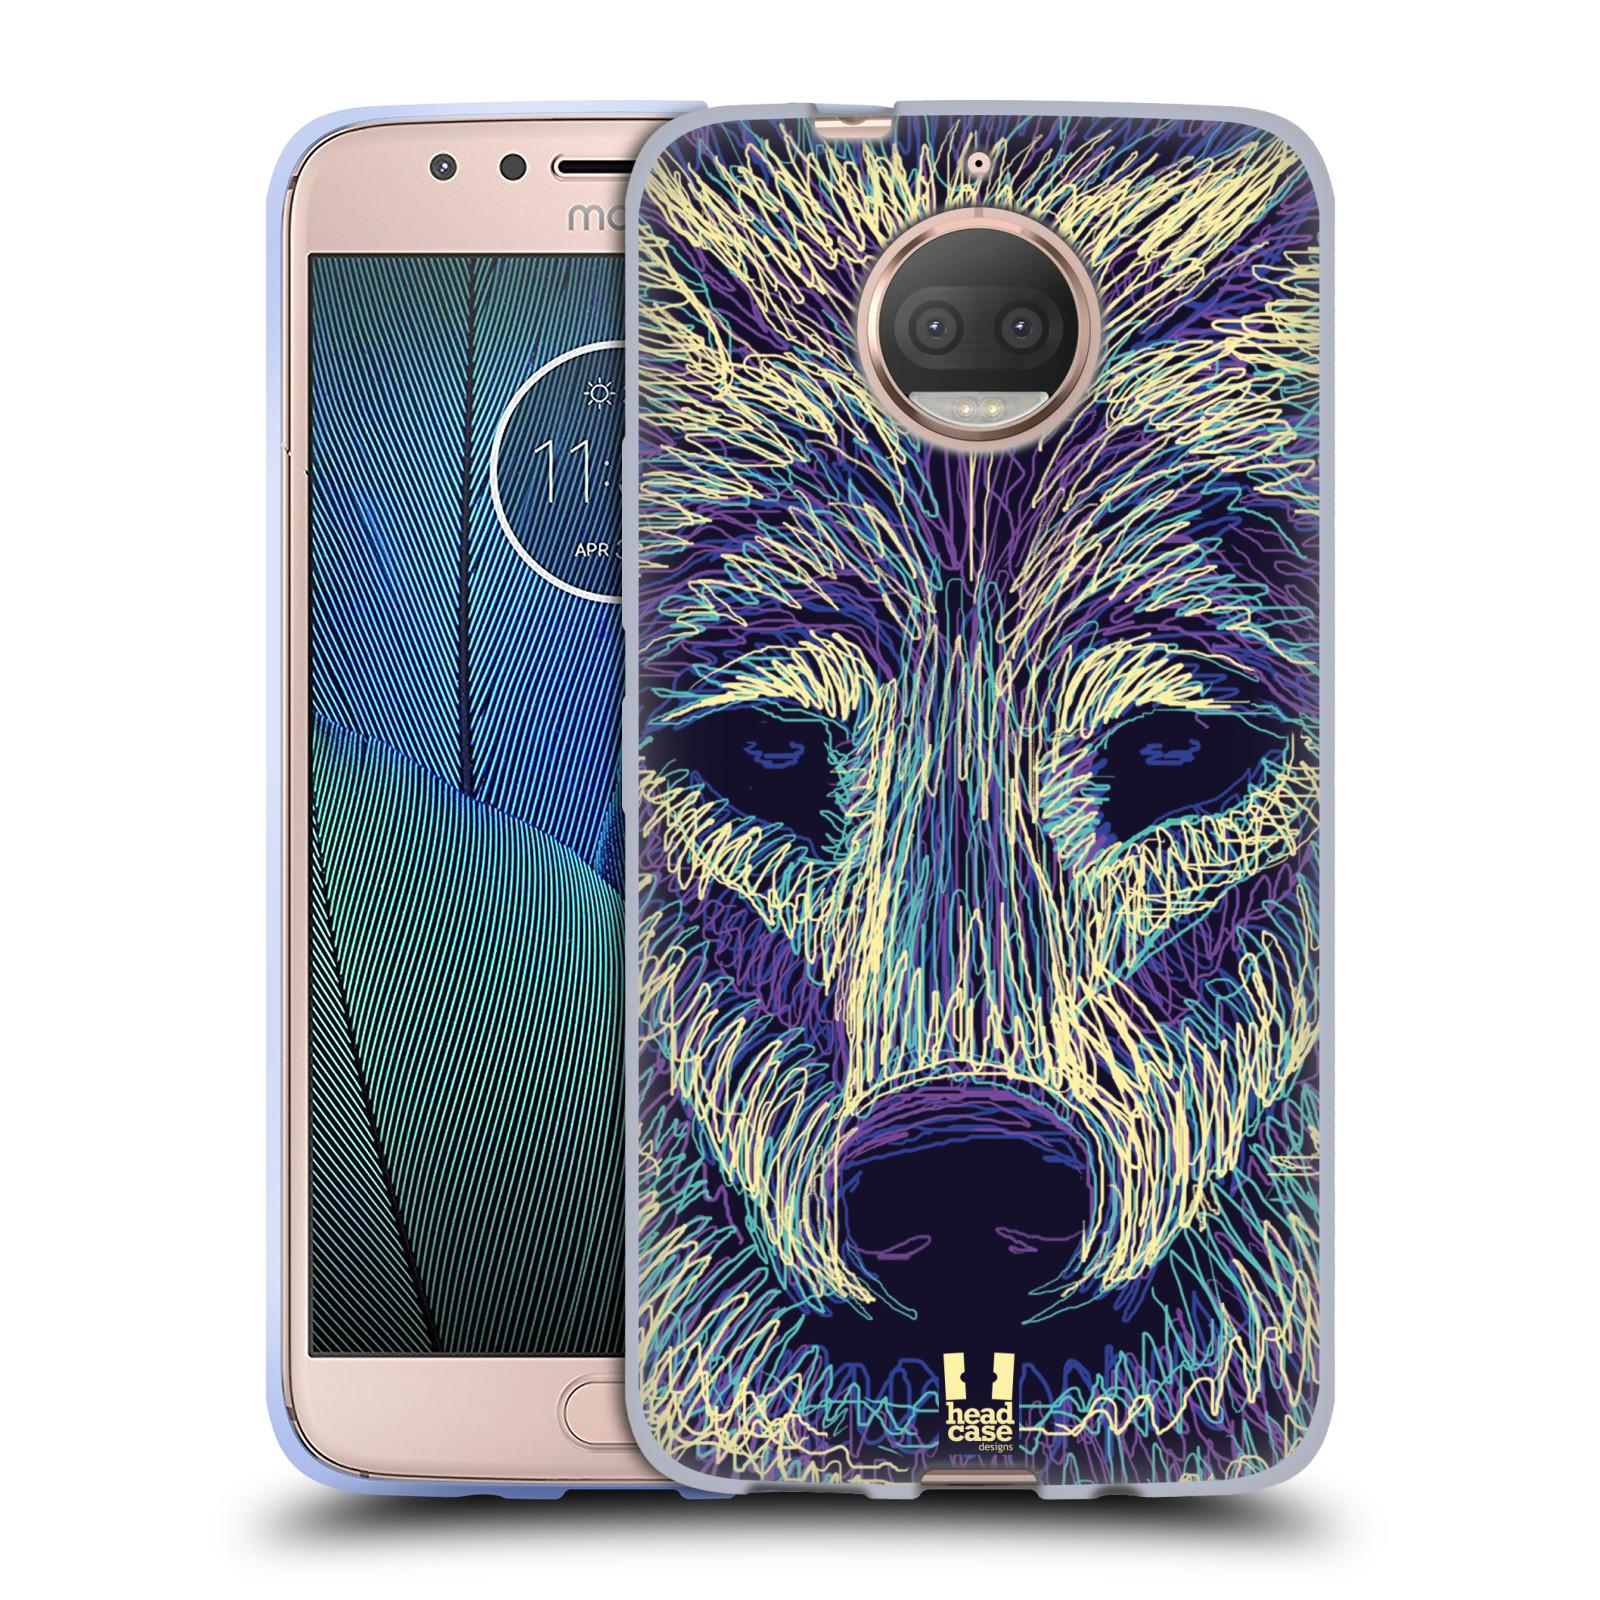 HEAD CASE silikonový obal na mobil Lenovo Moto G5s PLUS vzor zvíře čmáranice vlk